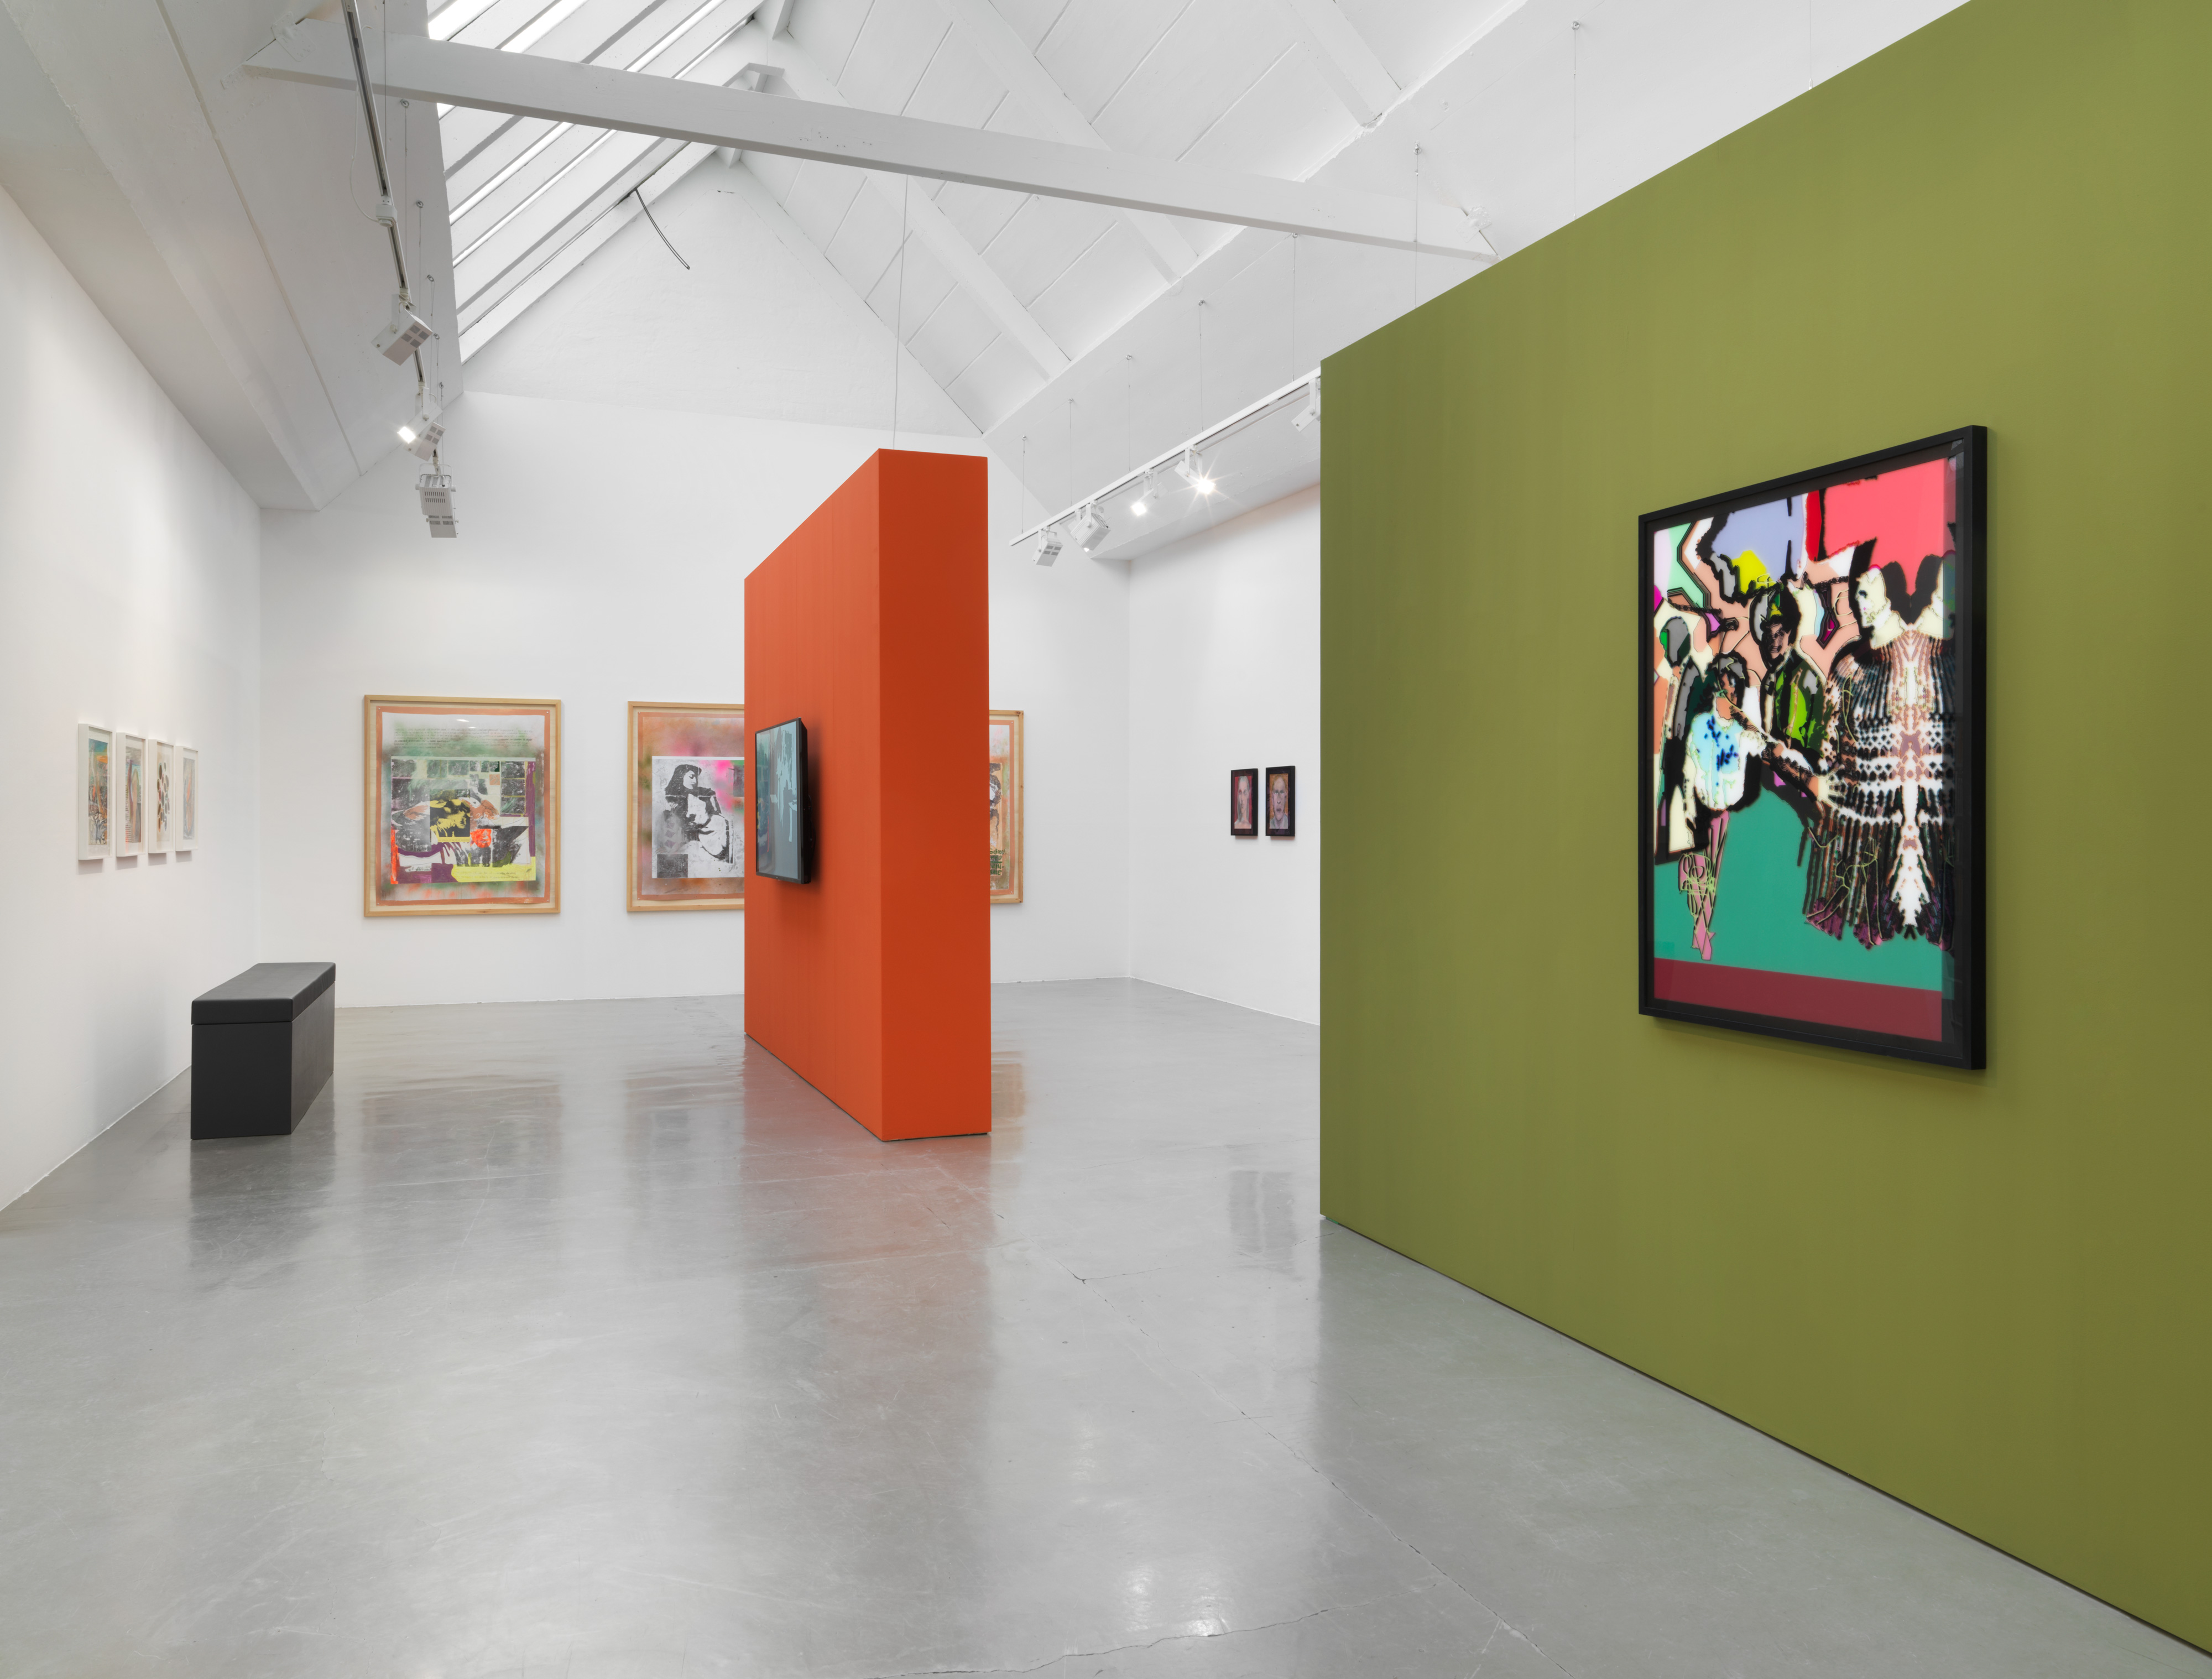 Galerie Barbara Thumm \ Anne-Mie van Kerckhoven – Unweit von Dir